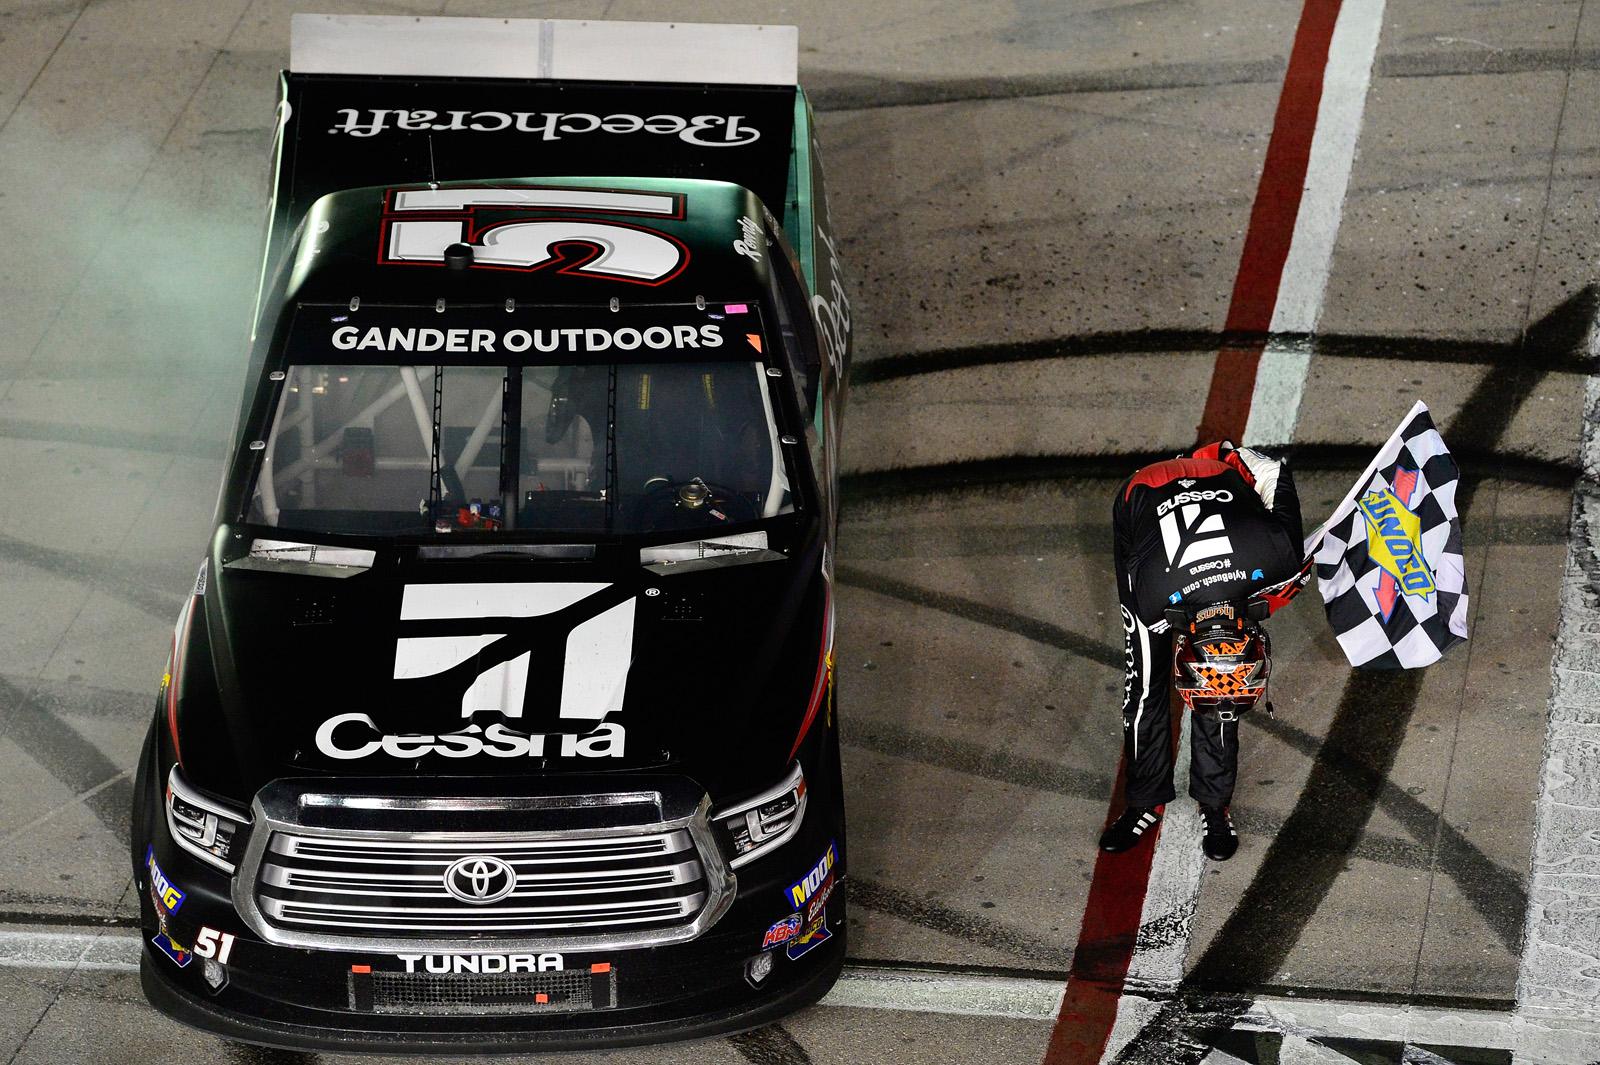 NASCAR Gander Outdoors Truck Series – Strat Las Vegas 200